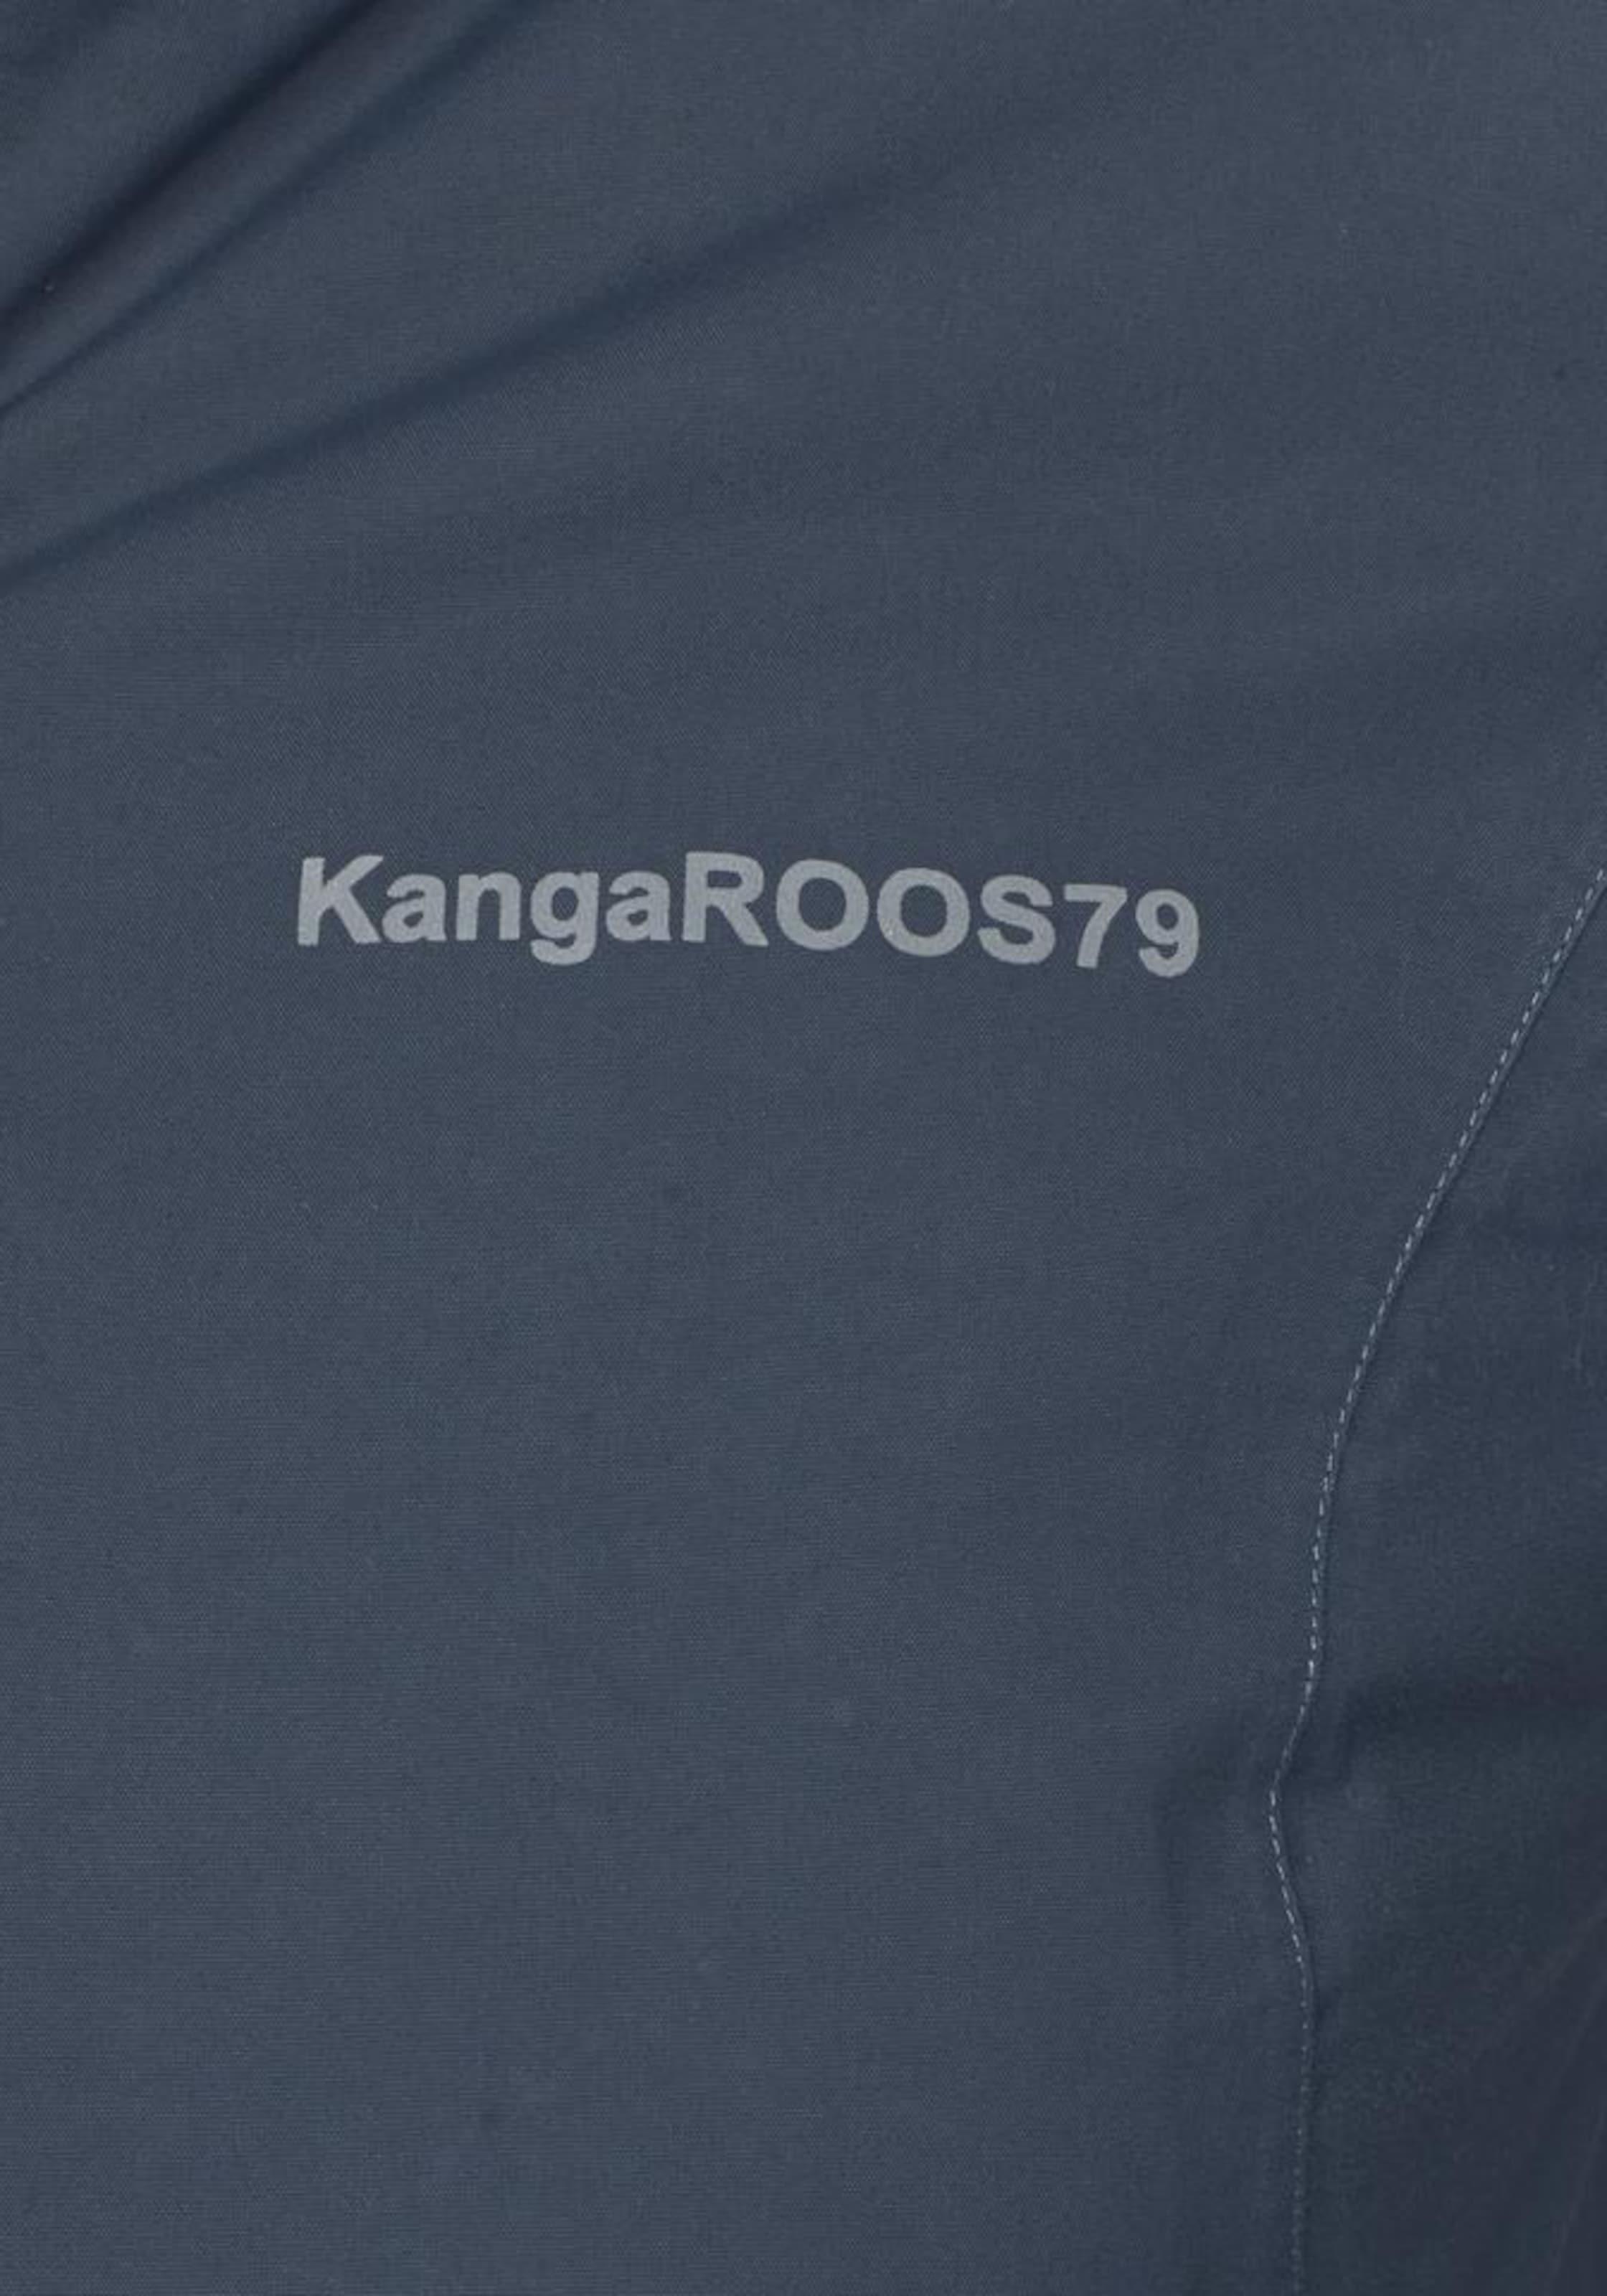 In BlauMarine Rauchblau Kangaroos Parka Taubenblau xQEdoWrCBe